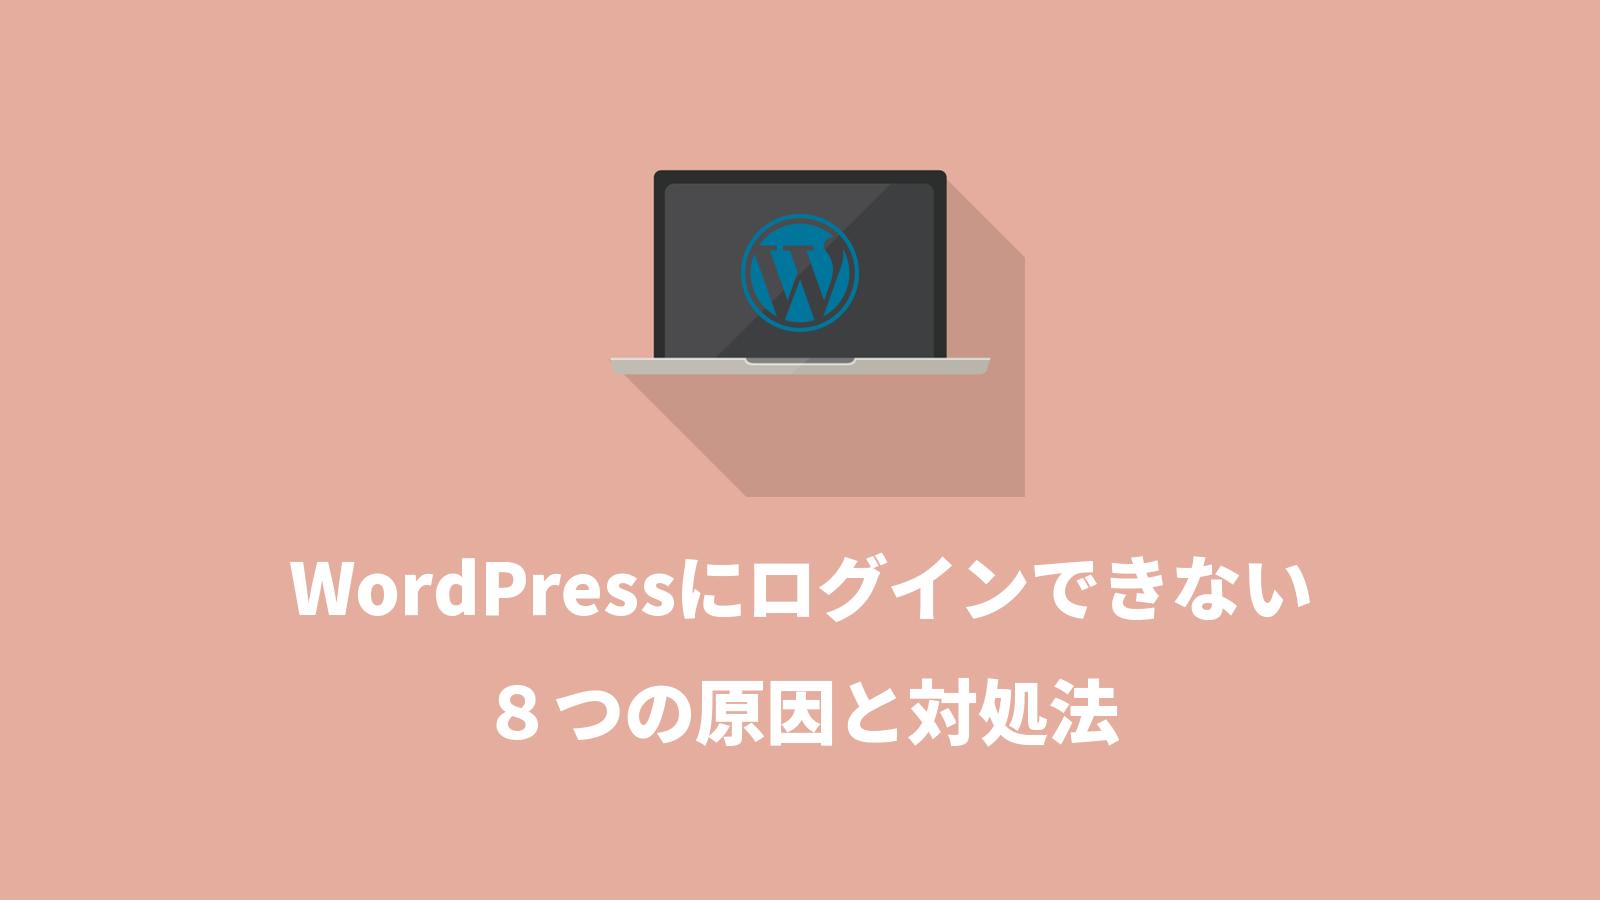 WordPressにログインできない8つの原因と対処法